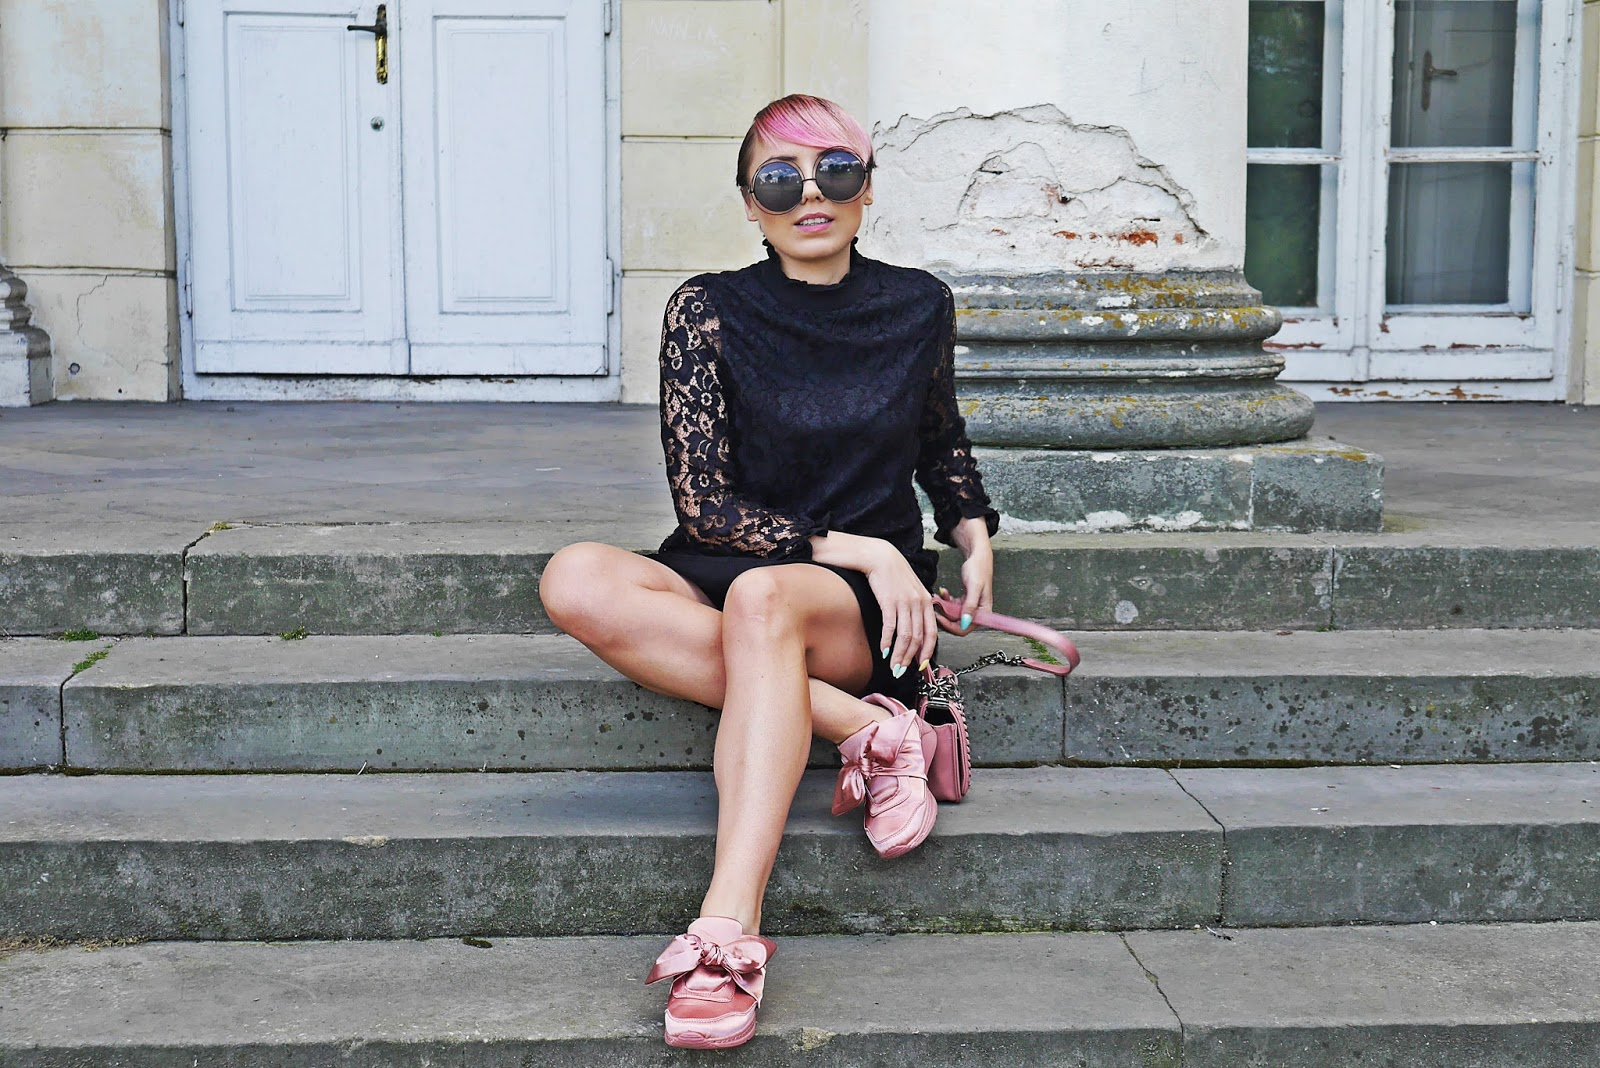 renee_shoes_pink_lace_dress_embroidery_bag_karyn_blog_modowy_150817ddf